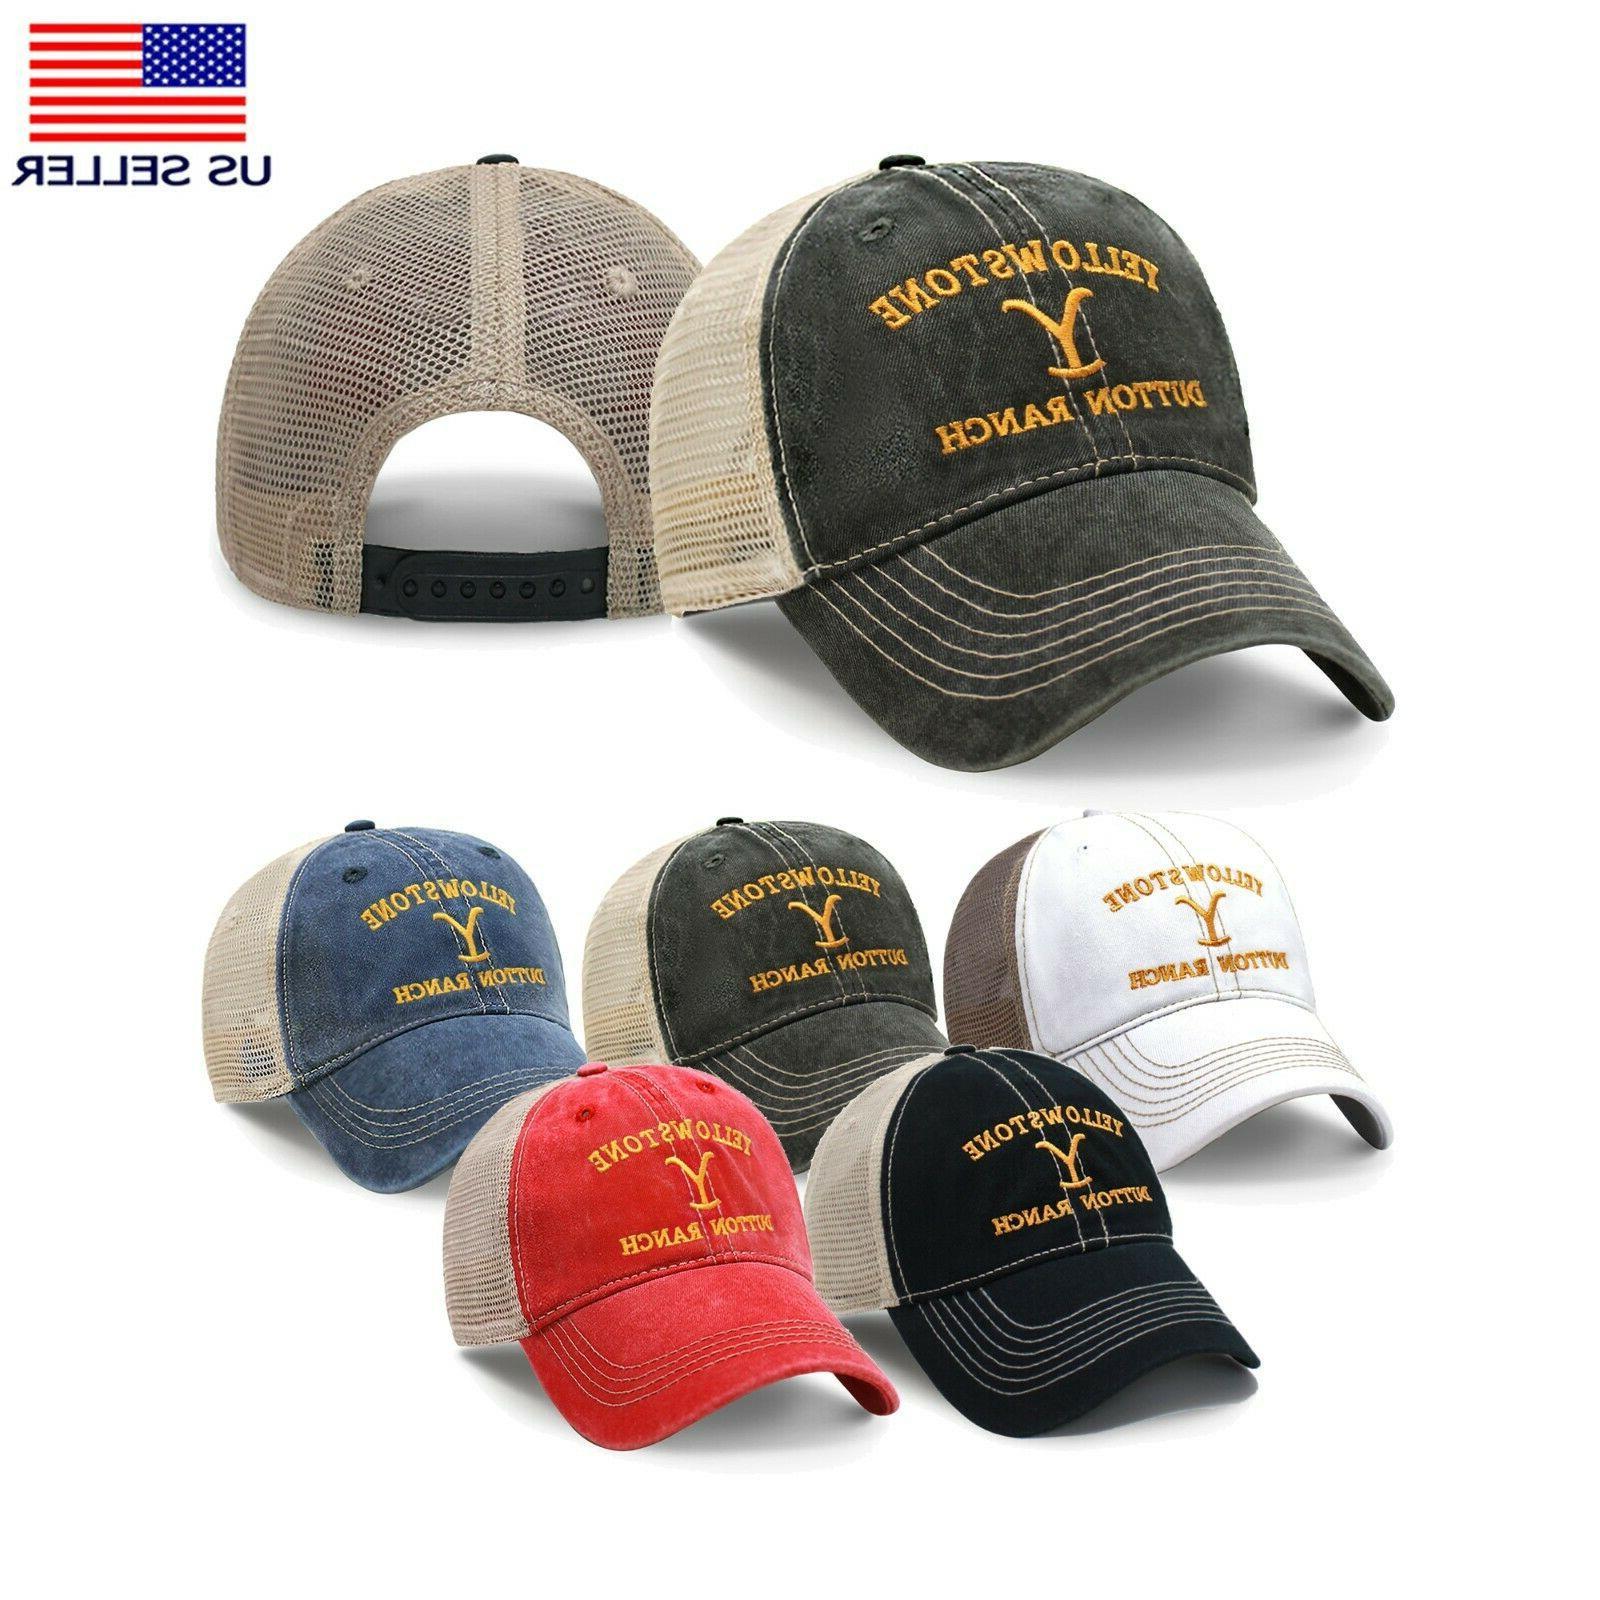 yellowstone dutton ranch trucker hat embroidered dad